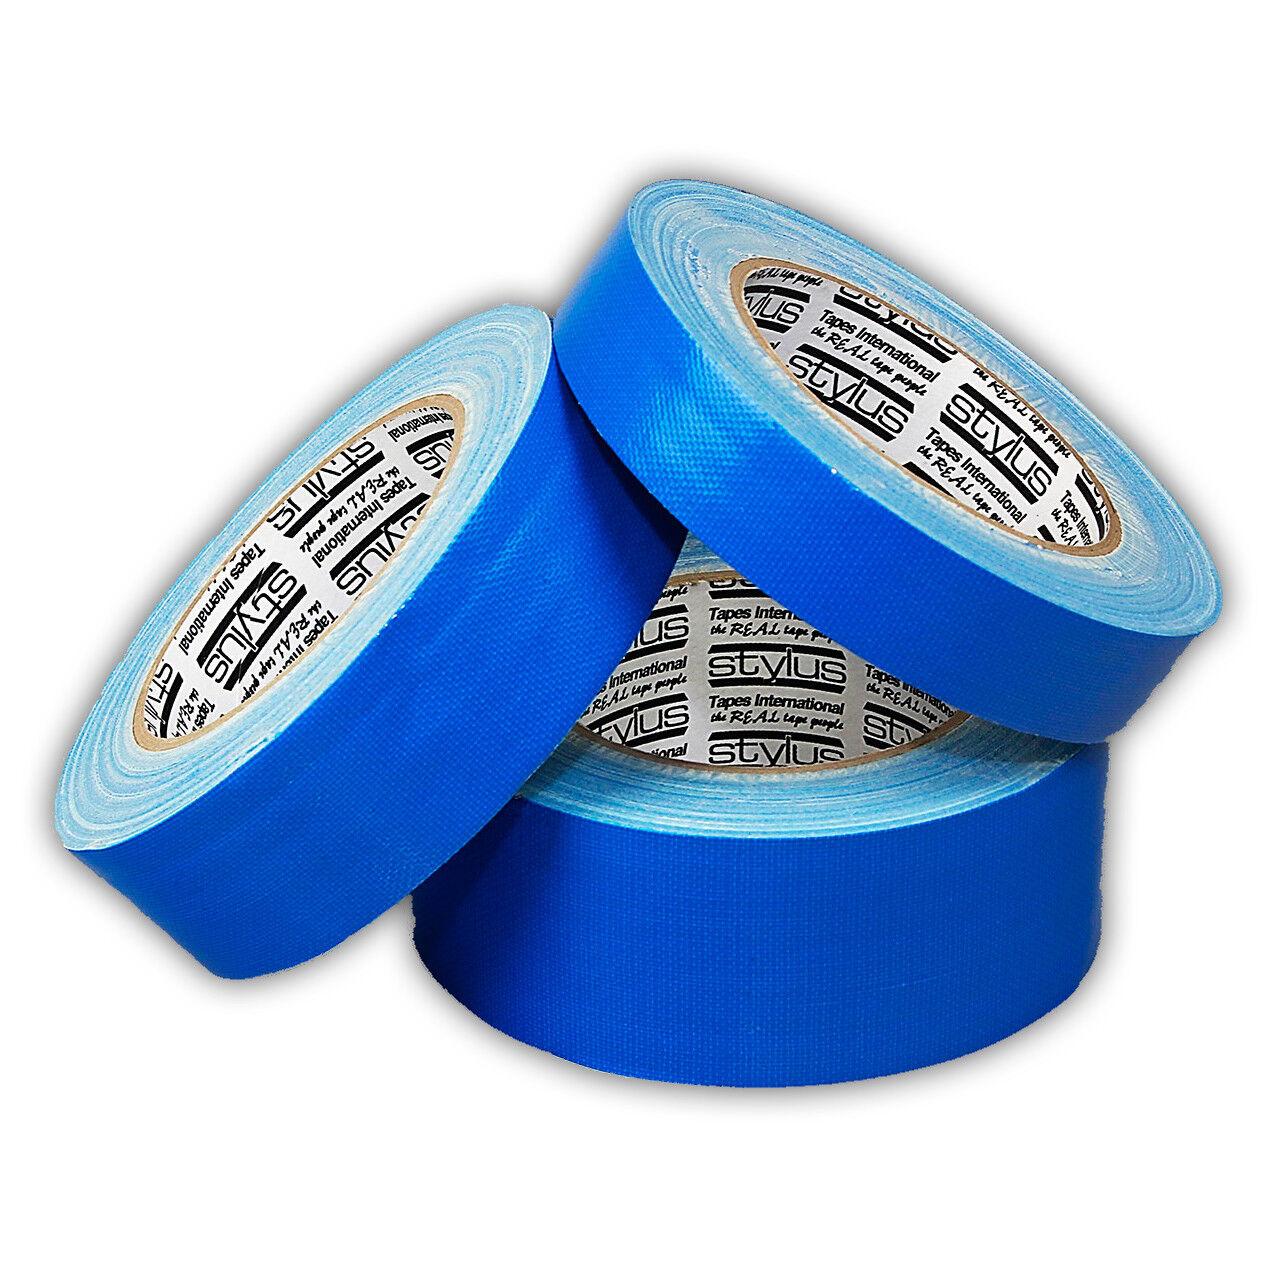 Box of 24 24 24 Rolls / Stylus Render's Blau 314 Outdoor Masking Cloth Tape 48mm x 25m d36a93